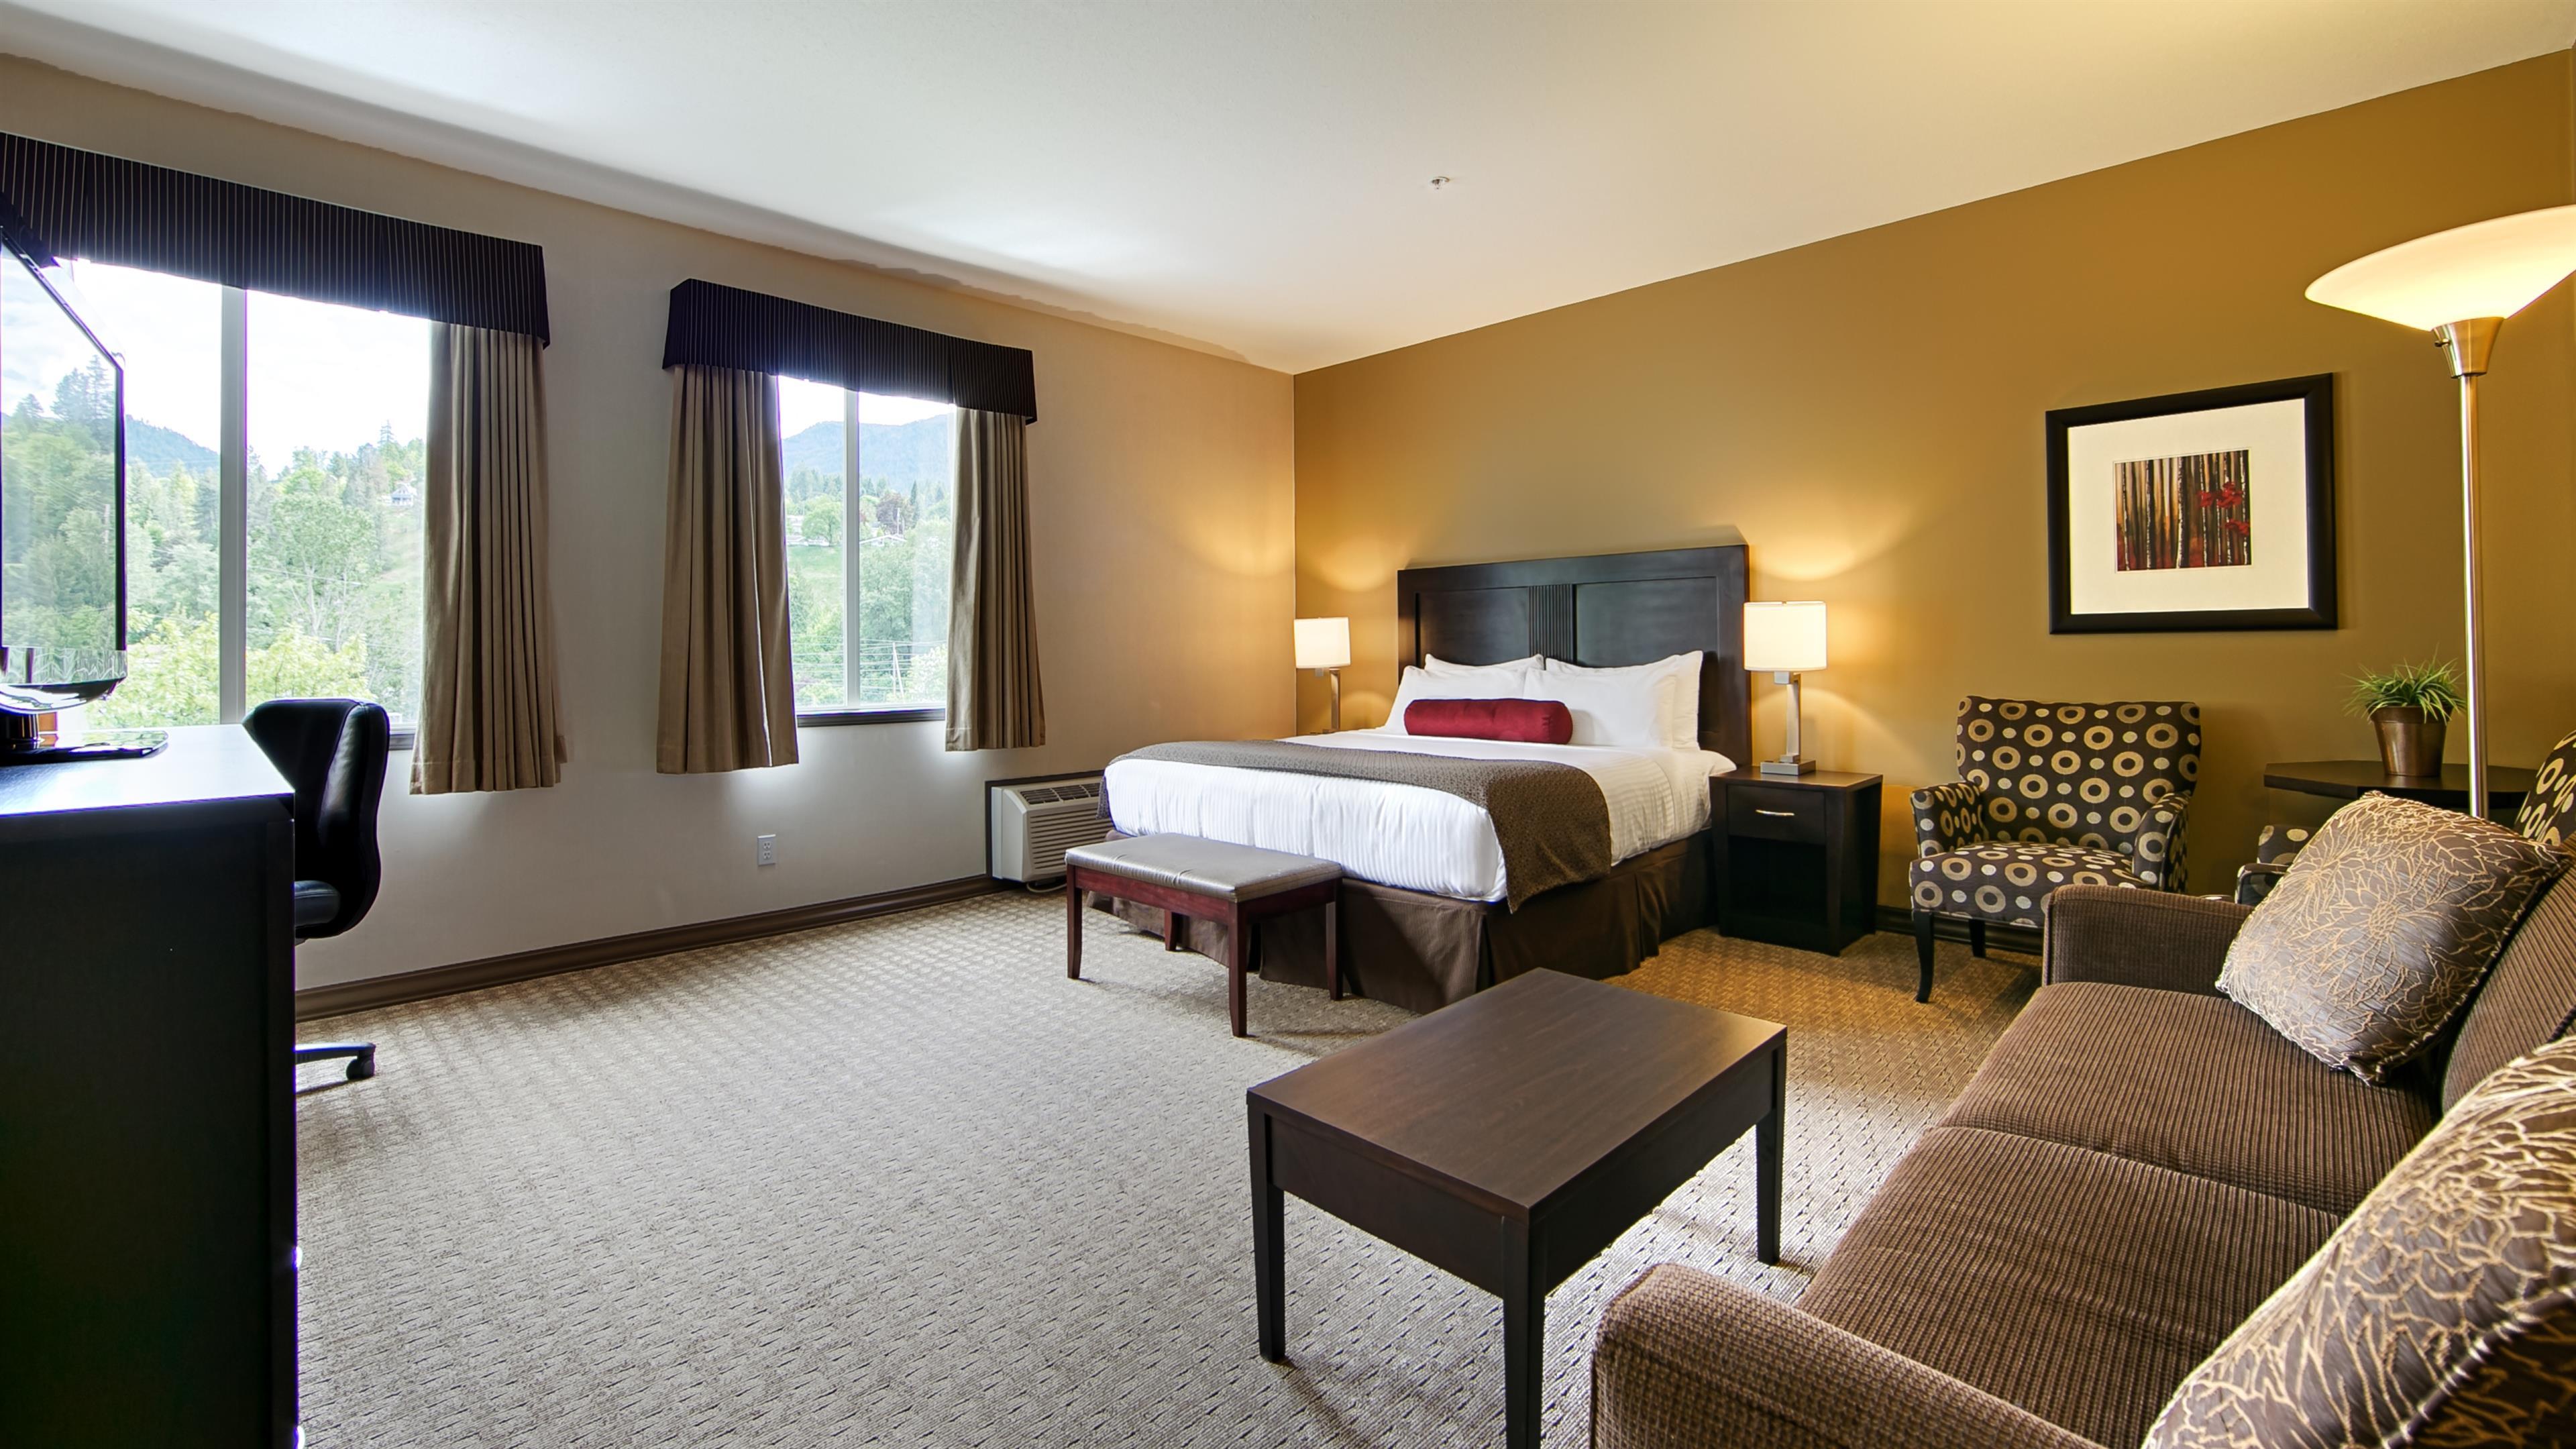 Best Western Plus Baker Street Inn & Convention Centre in Nelson: Deluxe King Room